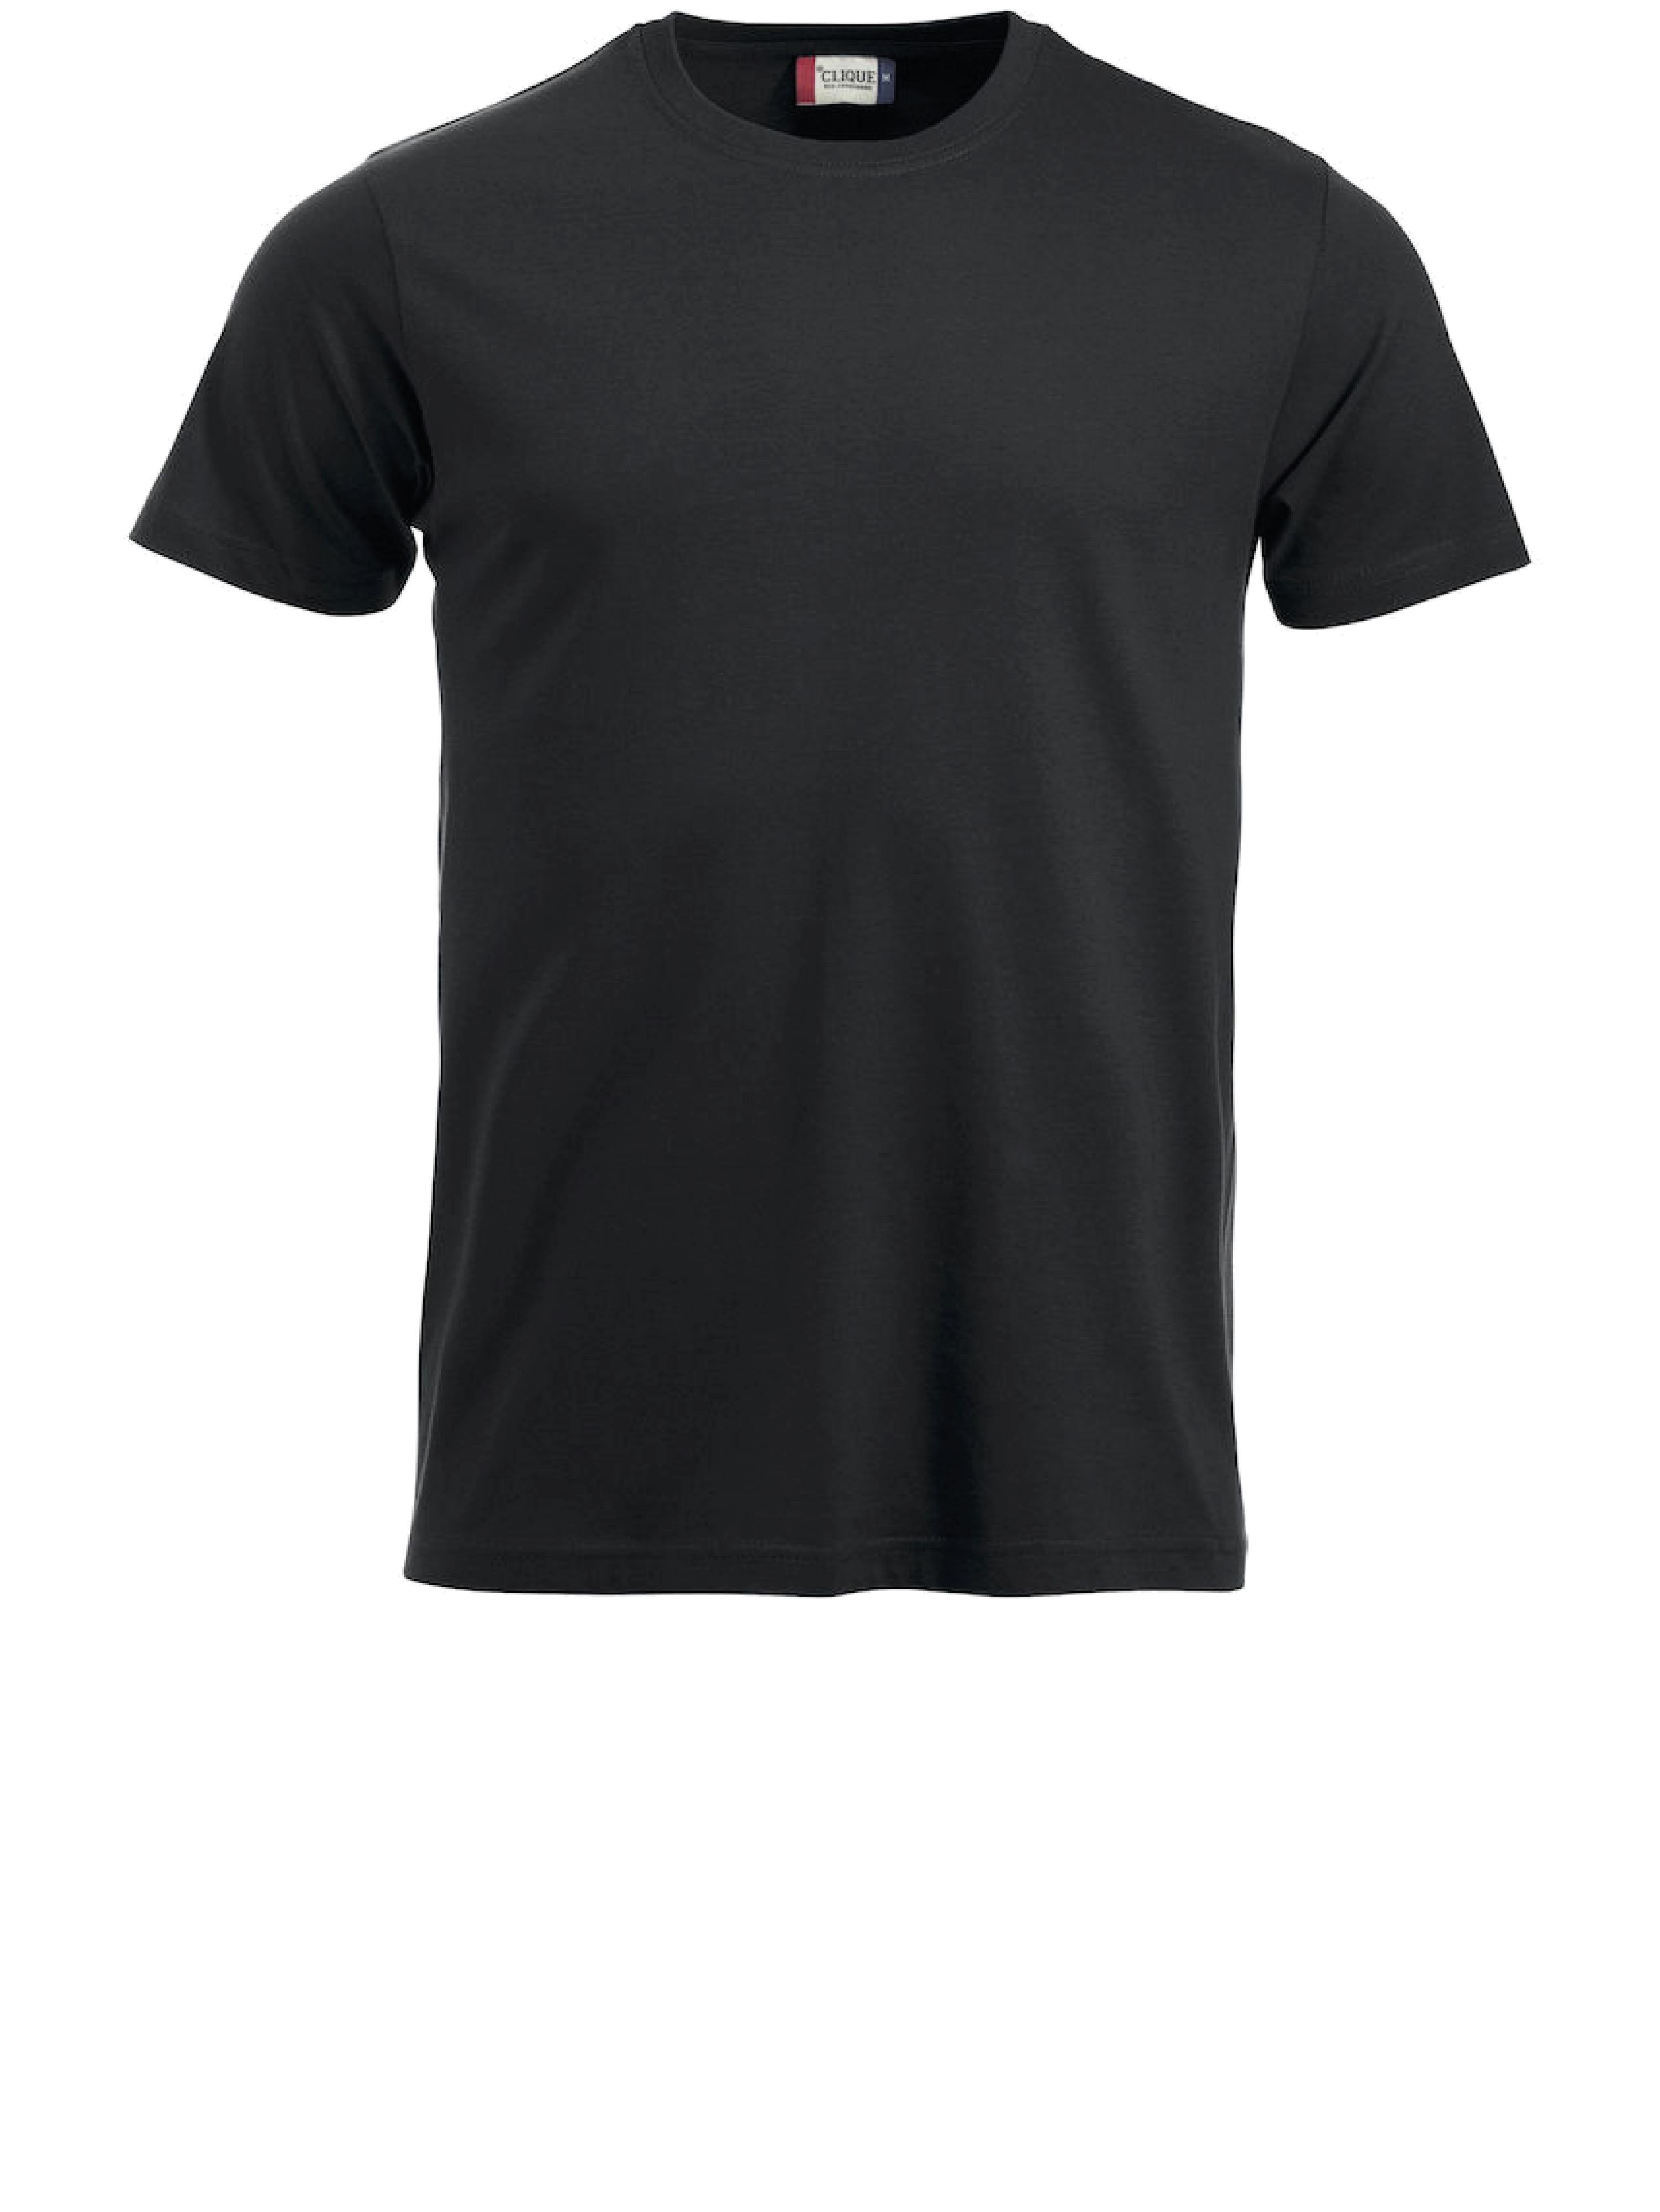 shirt schwarz-01.png